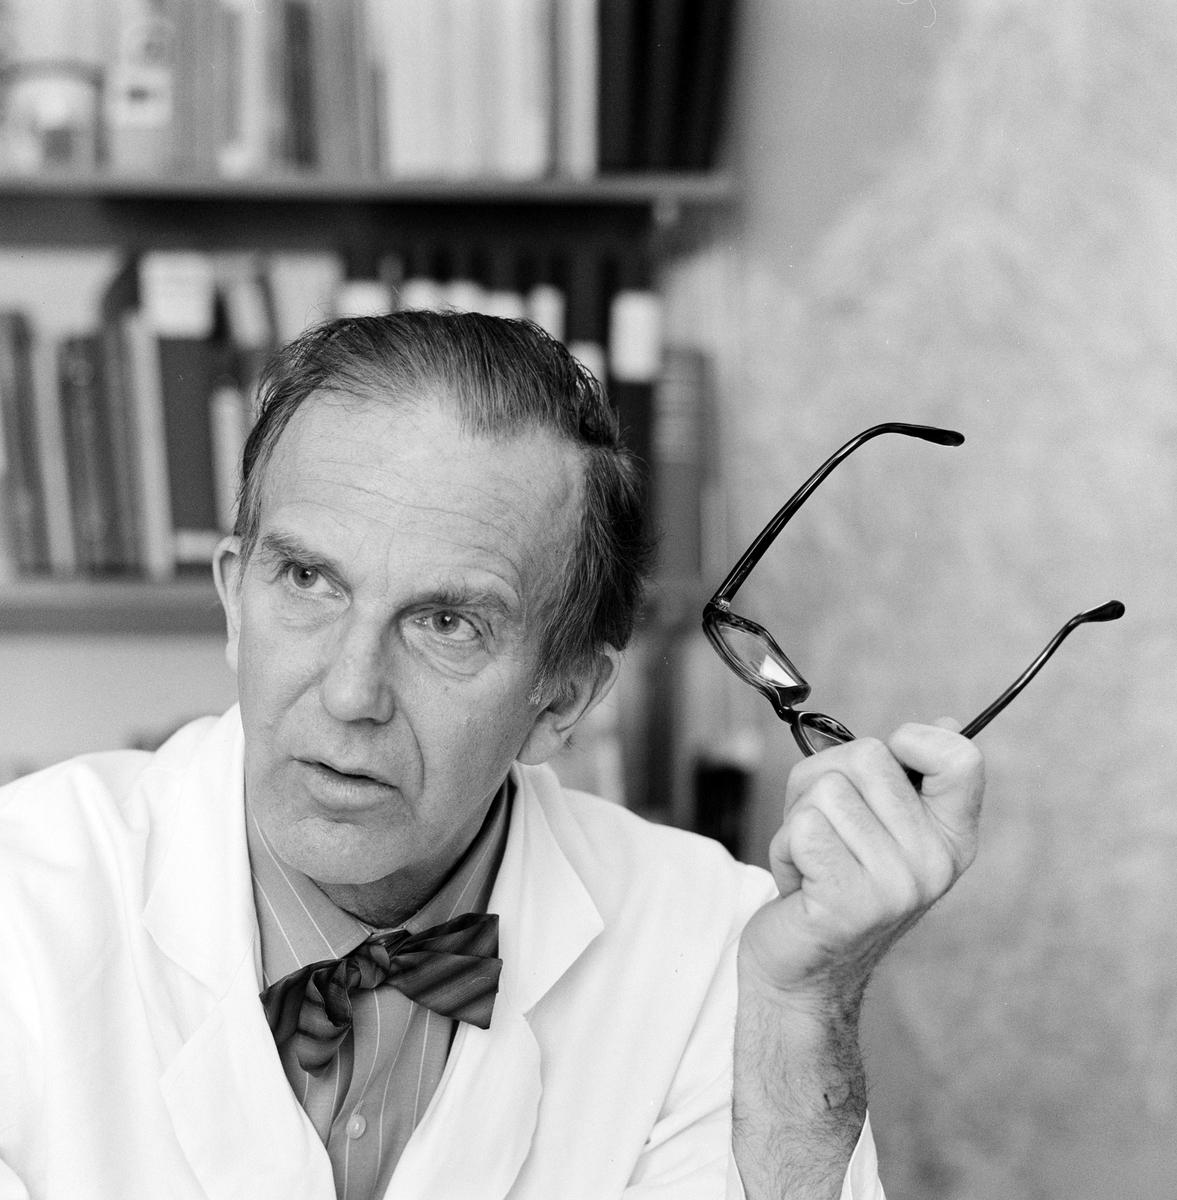 Doktor, Dr, Sten Rosenqvist, Centralstationen, cst